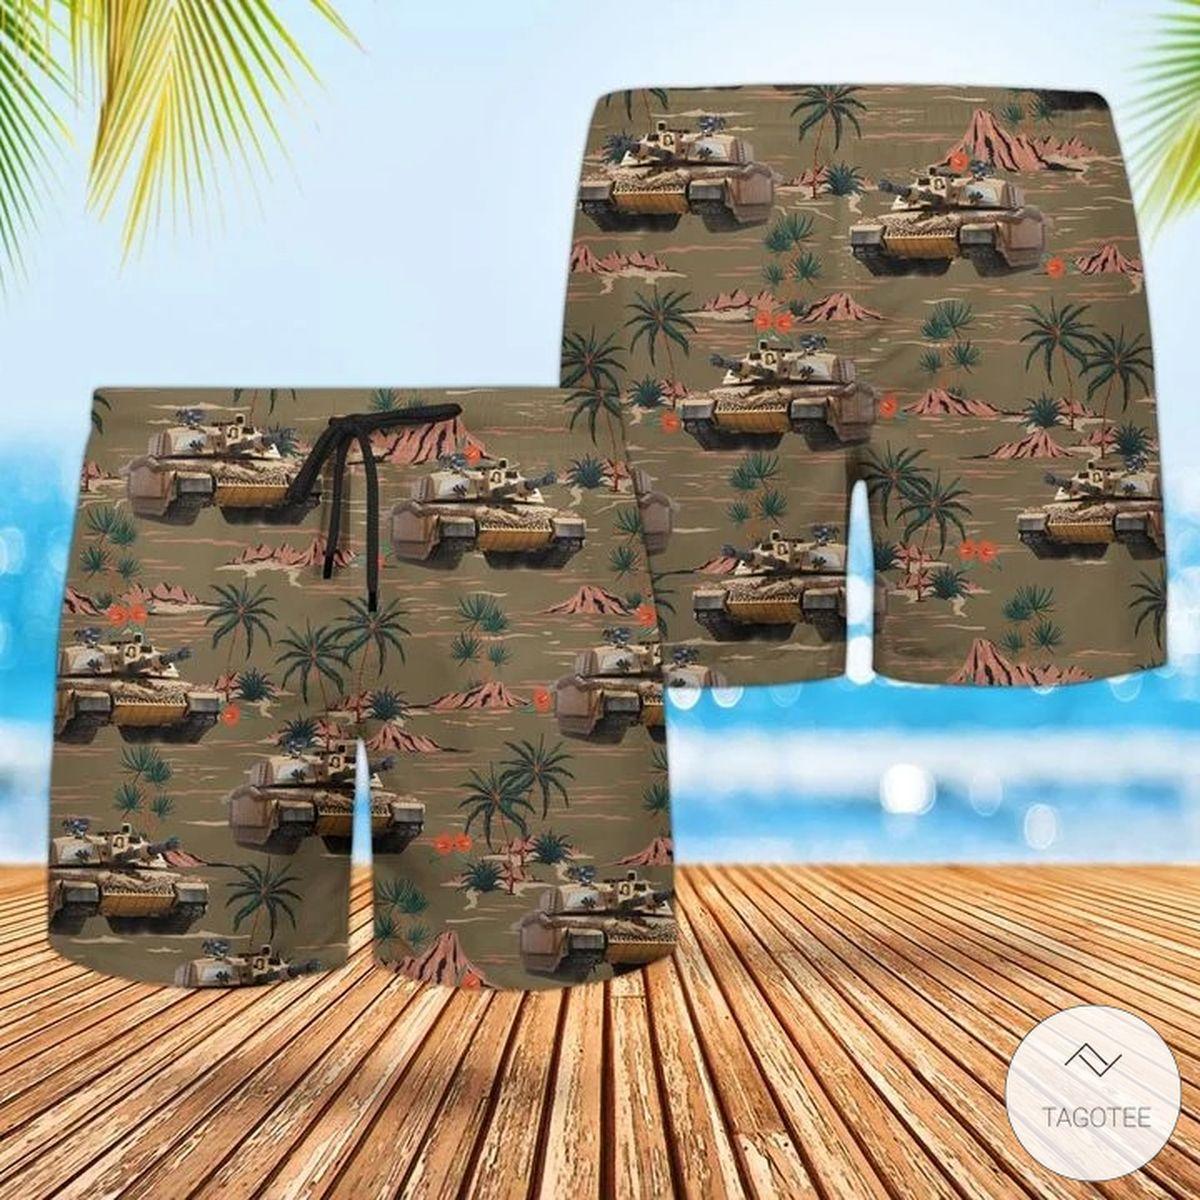 Buy In US British Army Challenger 2 Combat Vehicle Hawaiian Shirt, Beach Shorts